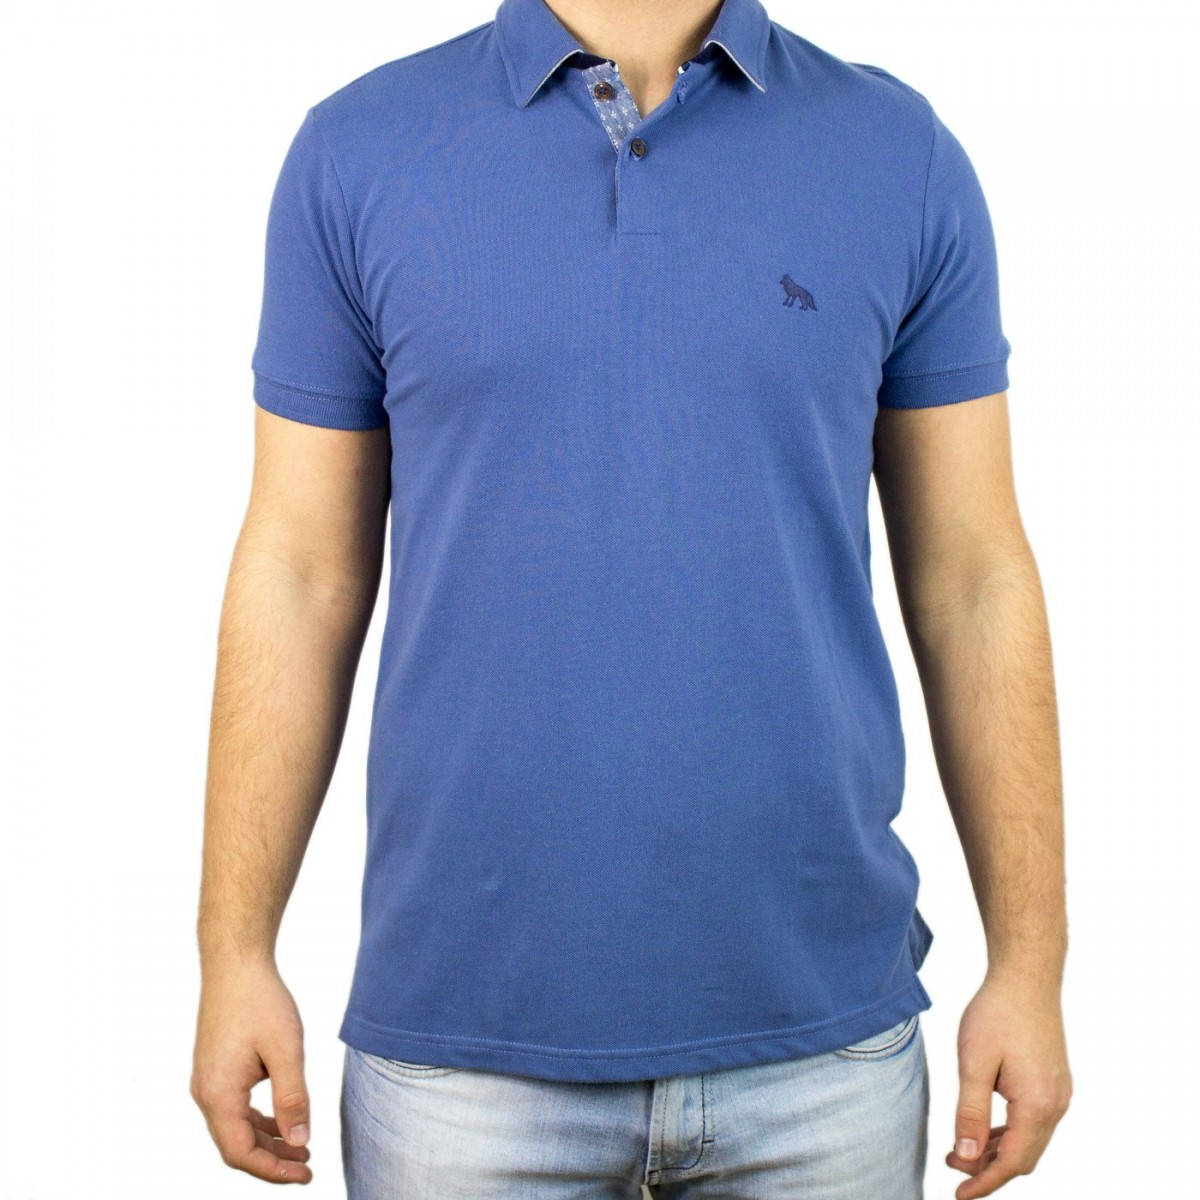 2c775ebc6 Bizz Store - Camisa Polo Masculina Acostamento Manga Curta